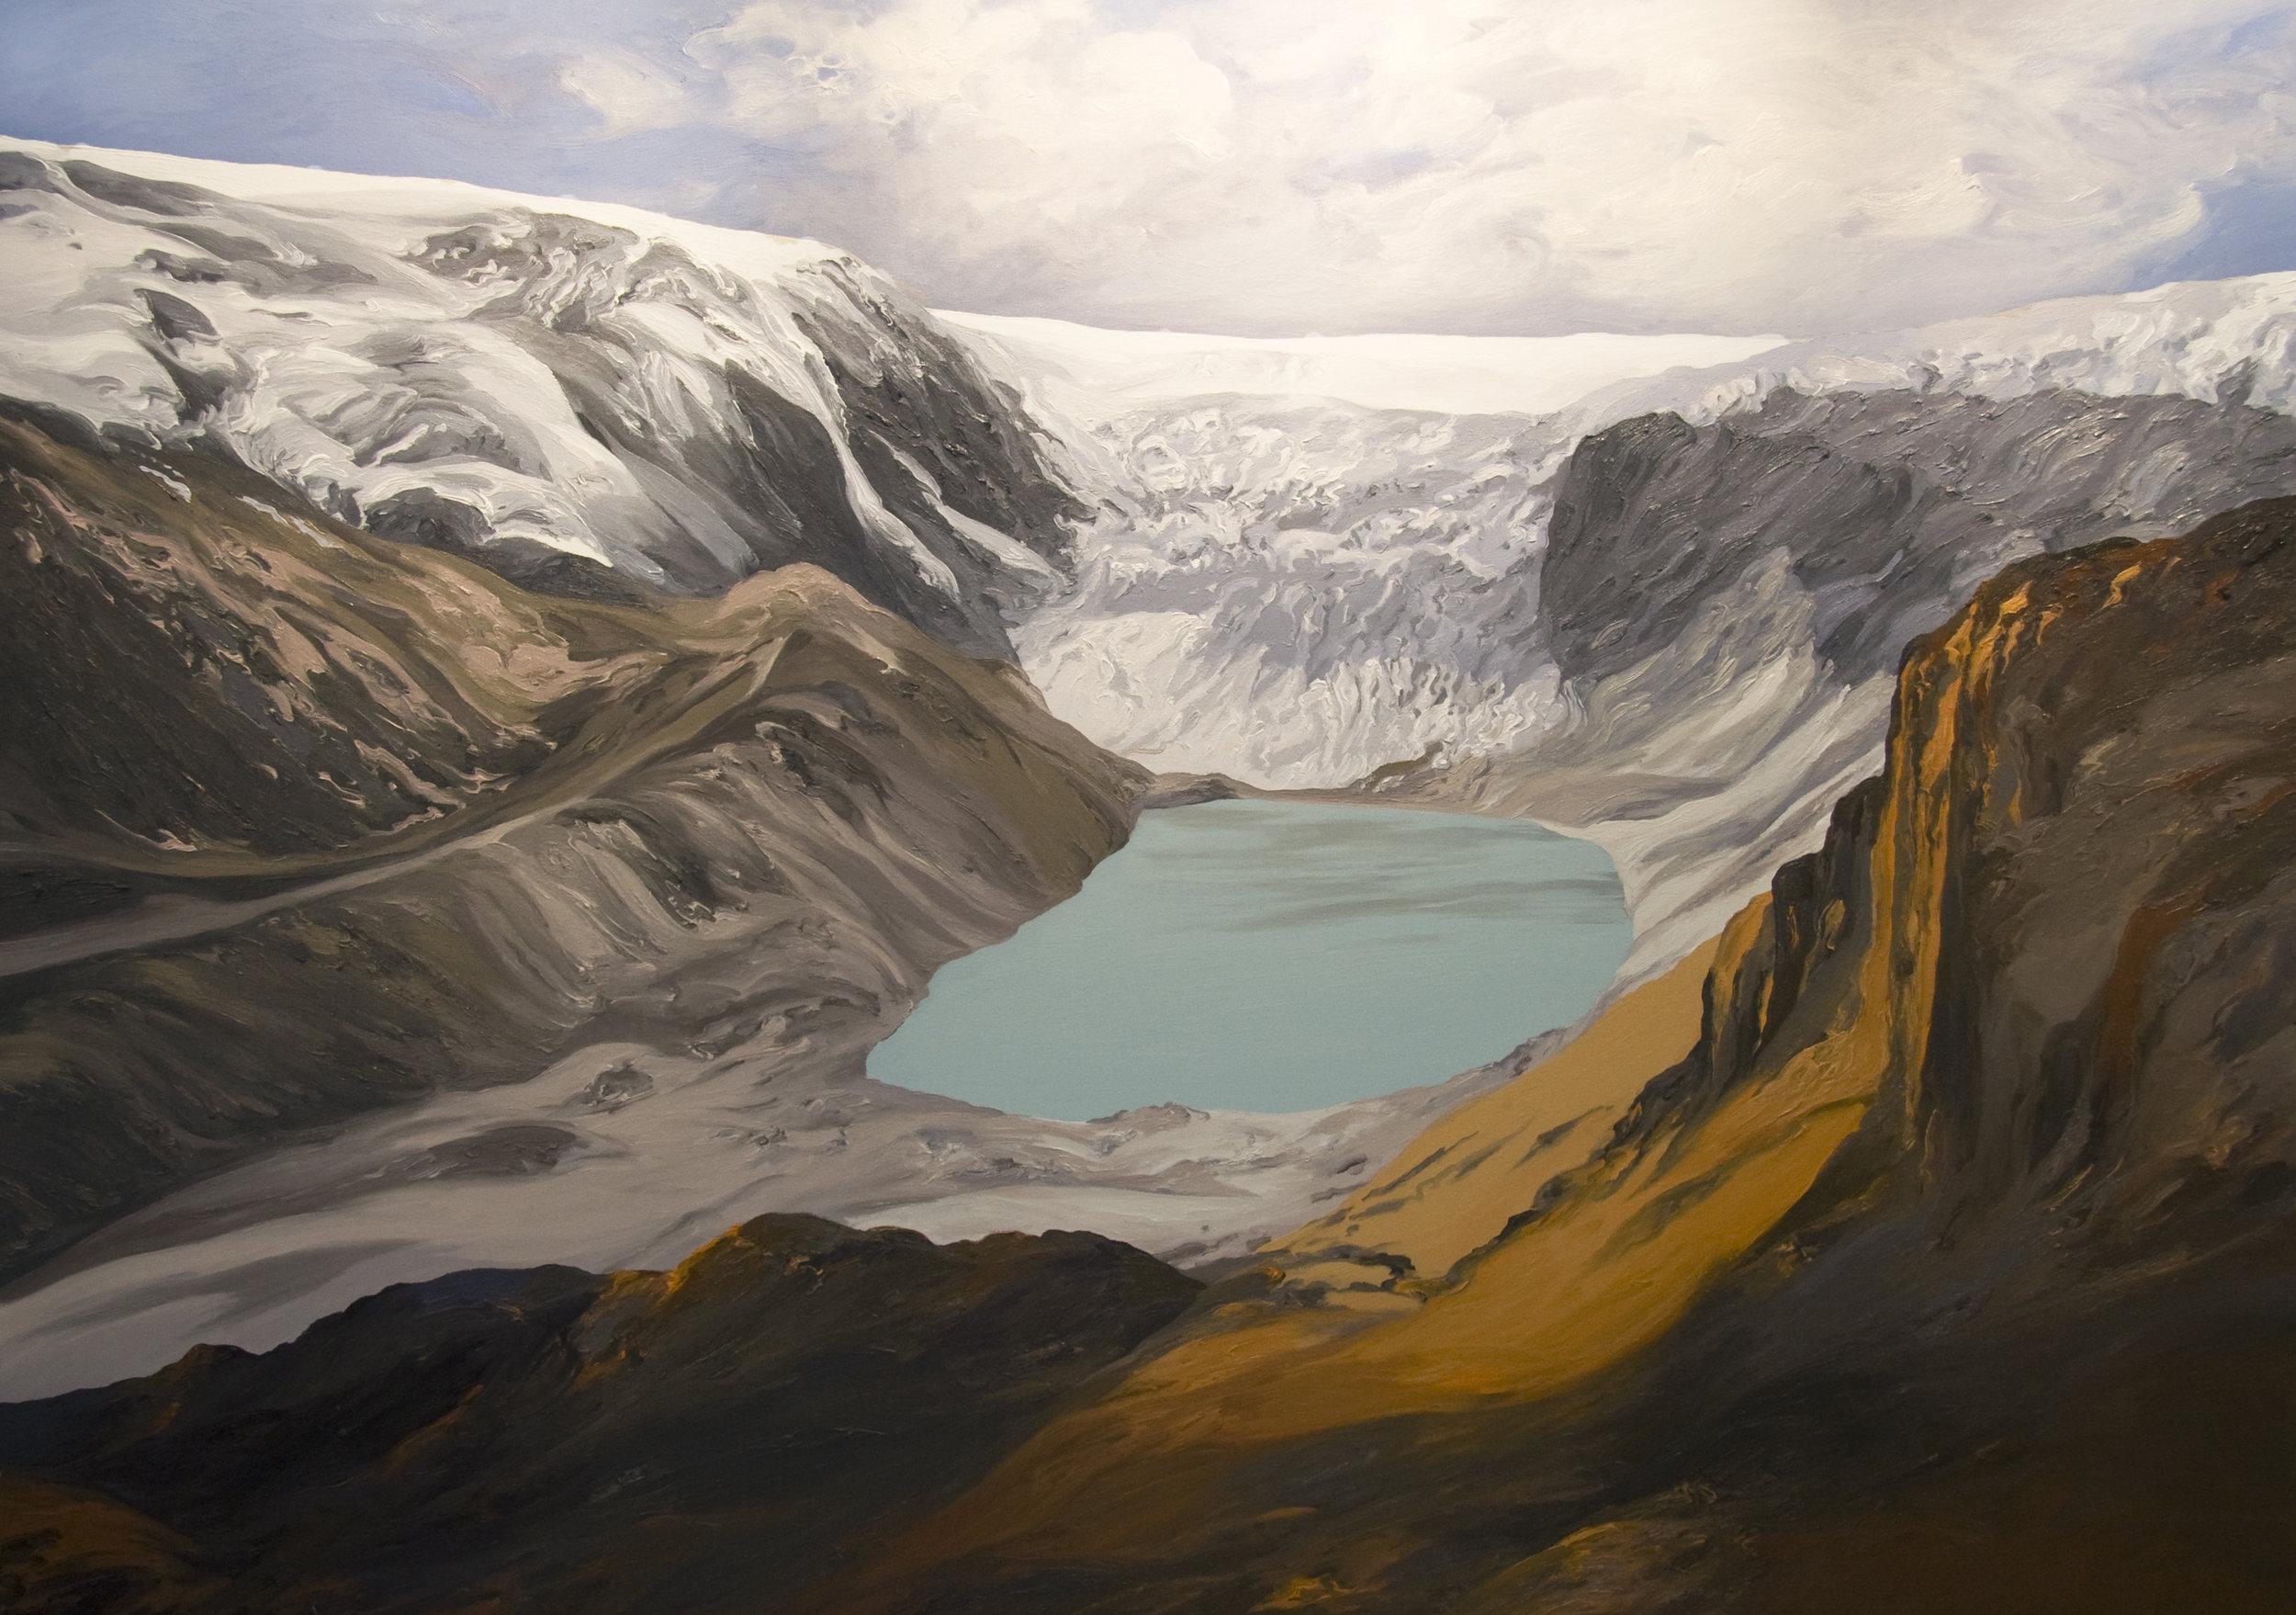 Qori Kalis Glacier #4, 2007, after Henry Brecher